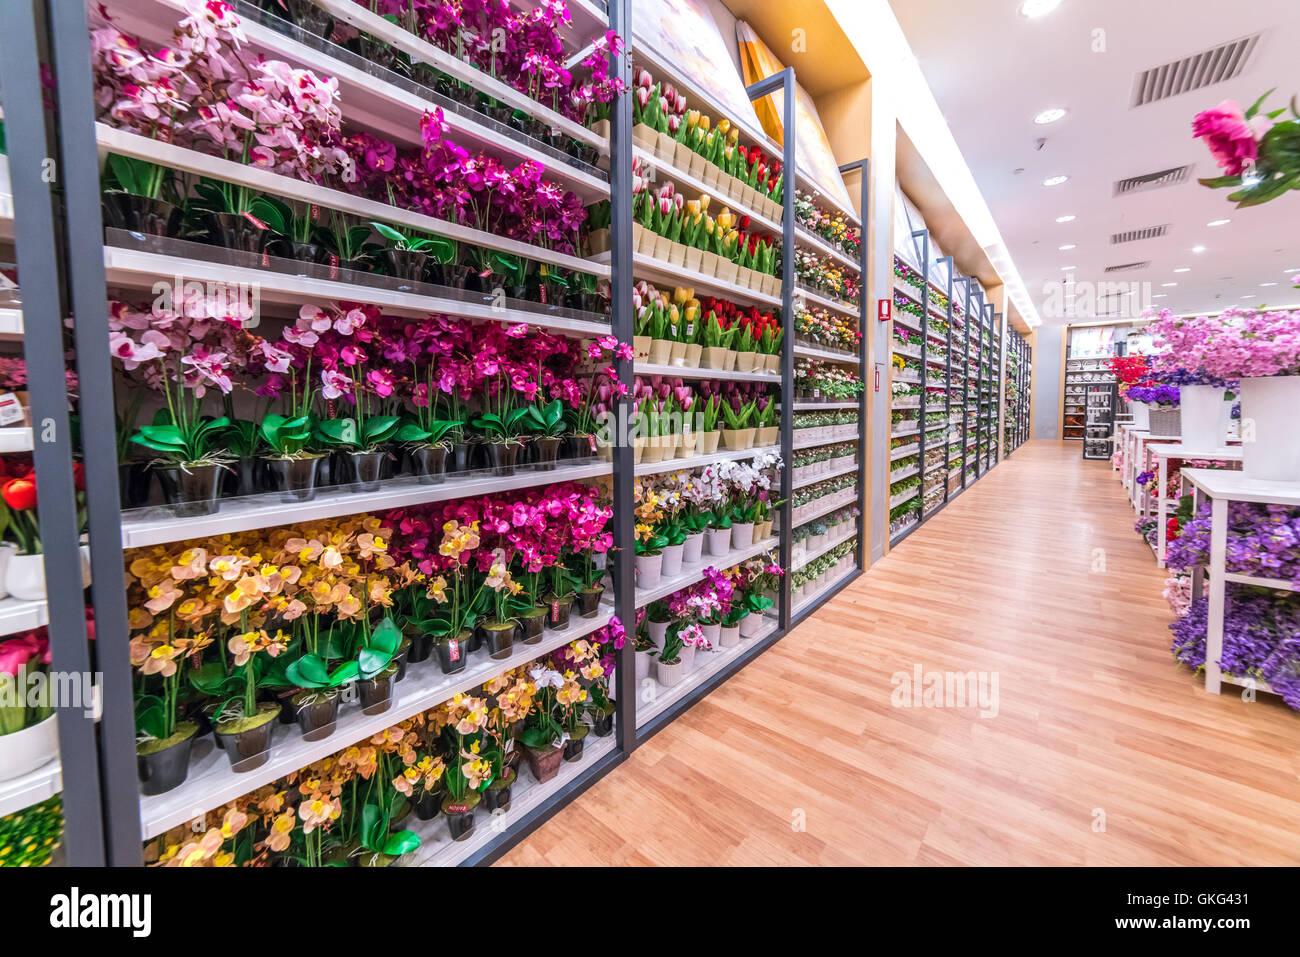 Kuala lumpur malaysia may 30 2016 paper flower shop at setia kuala lumpur malaysia may 30 2016 paper flower shop at setia mall setia alam selangor mightylinksfo